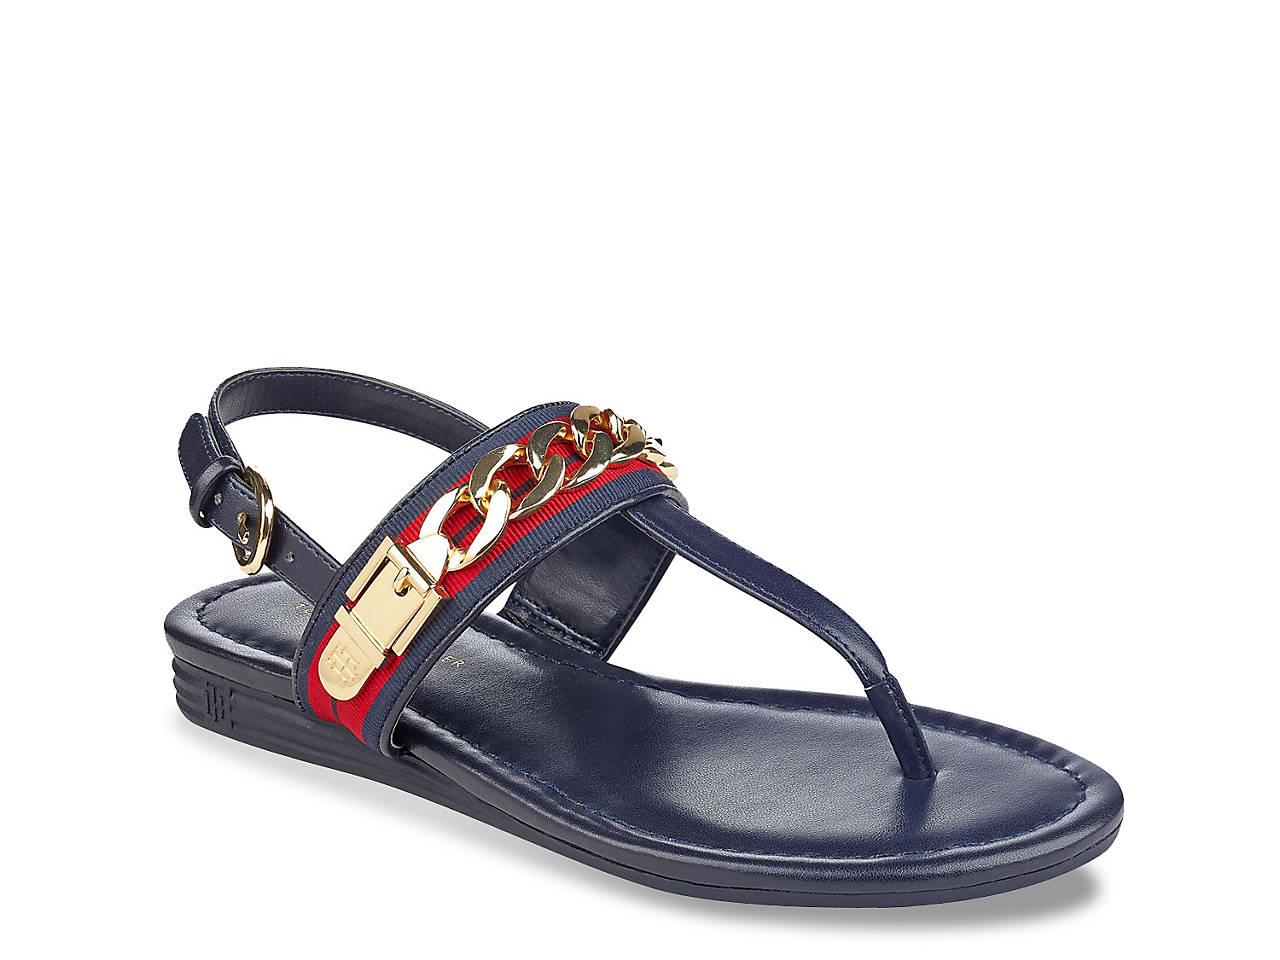 1e771258ae9d Tommy Hilfiger Hakim Flat Sandal Women s Shoes